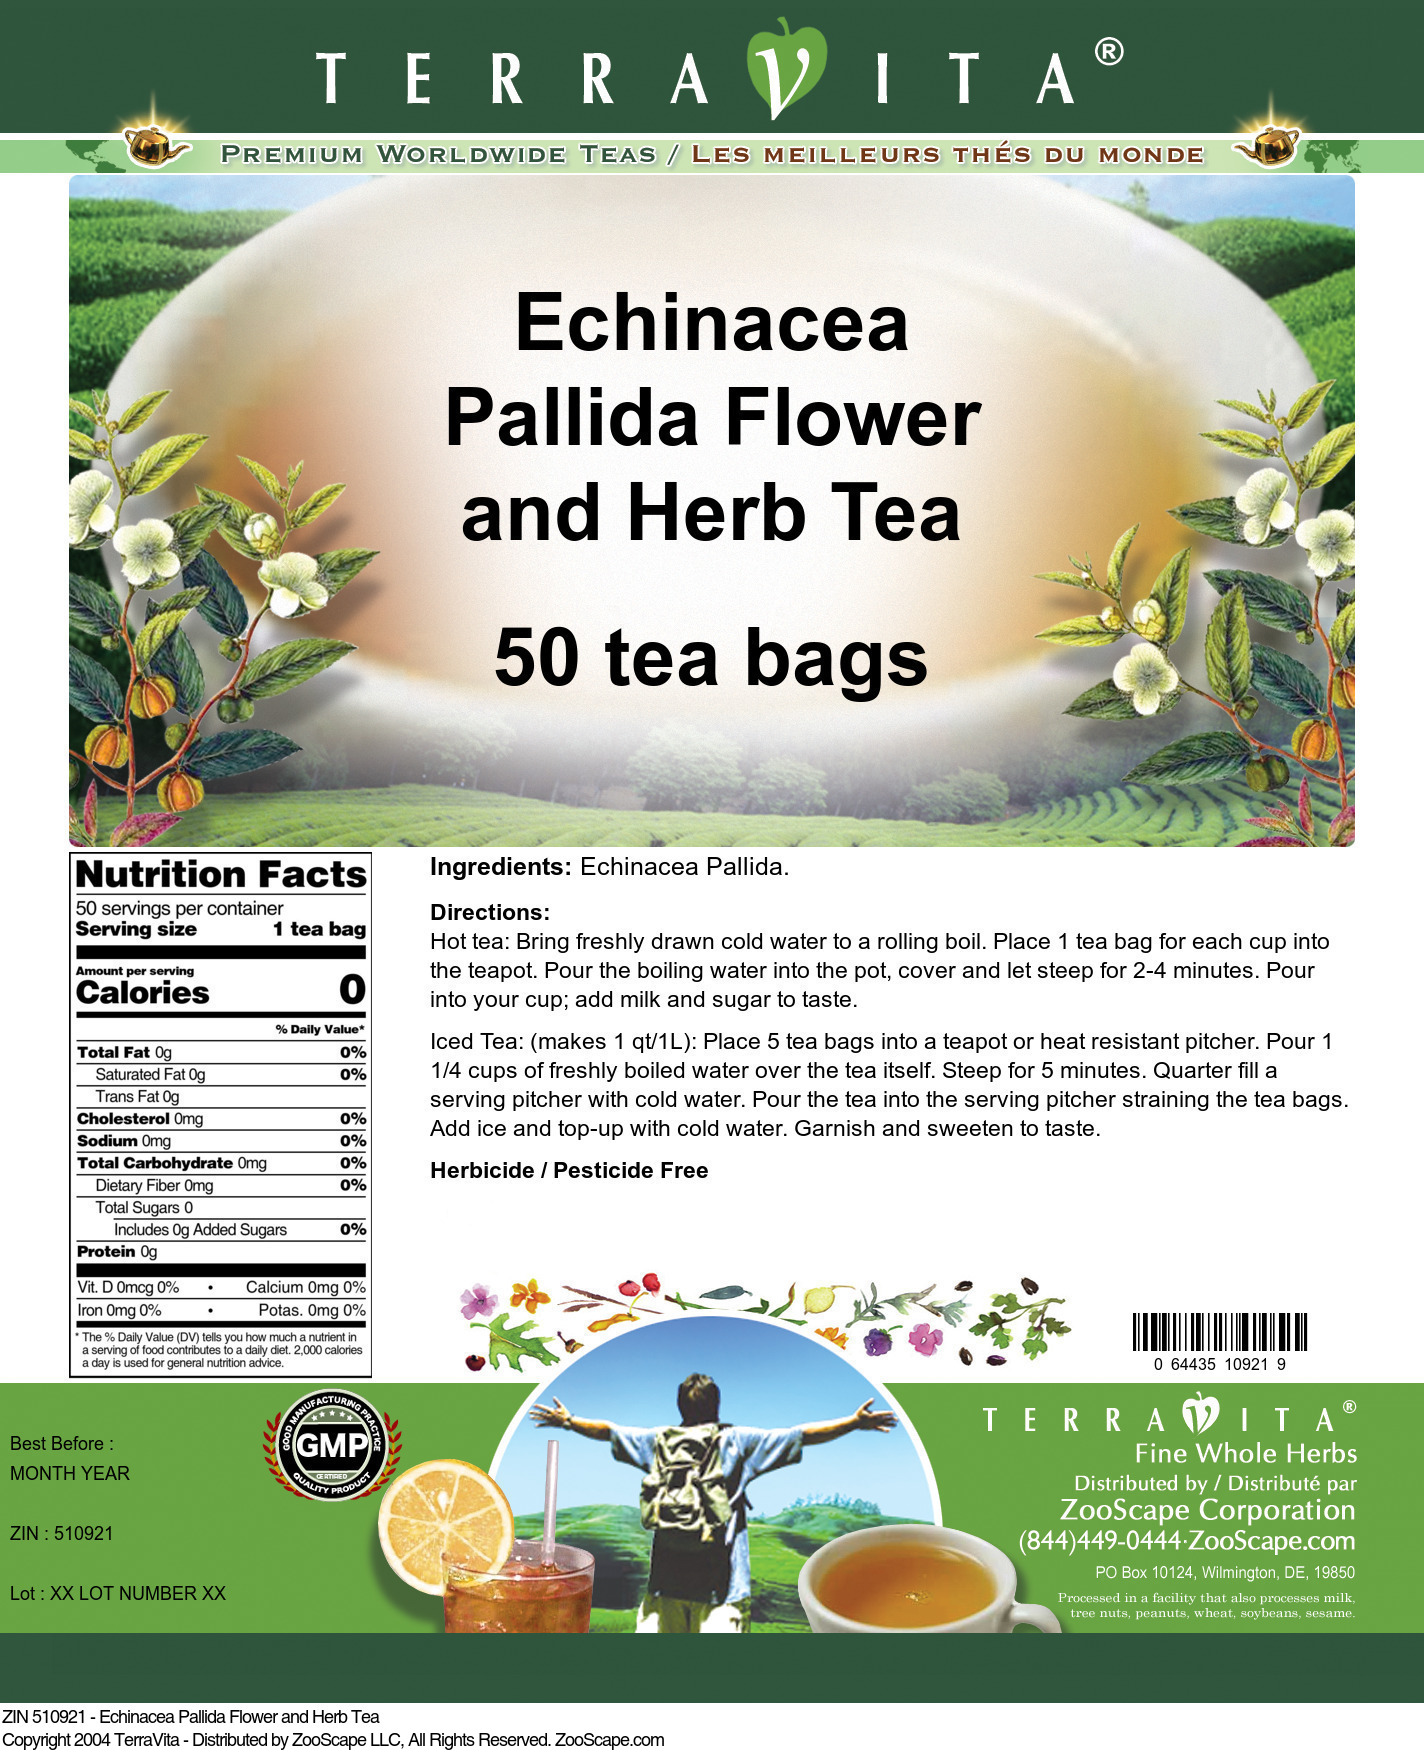 Echinacea Pallida Flower and Herb Tea